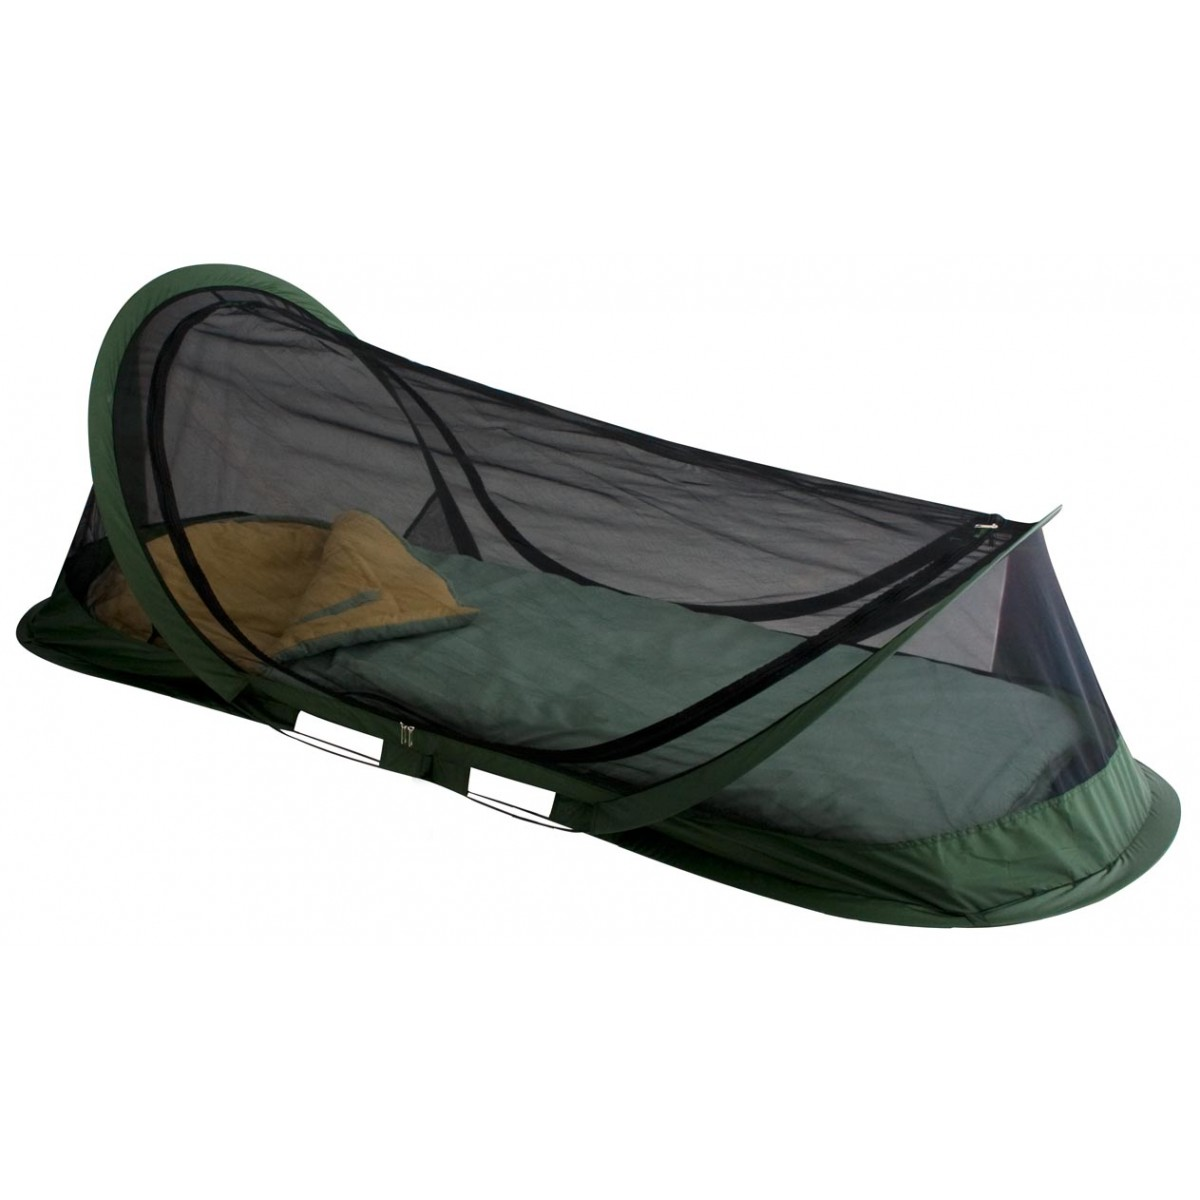 Tente Moustiquaire Travel Safe Bushcraft Outback Inuka